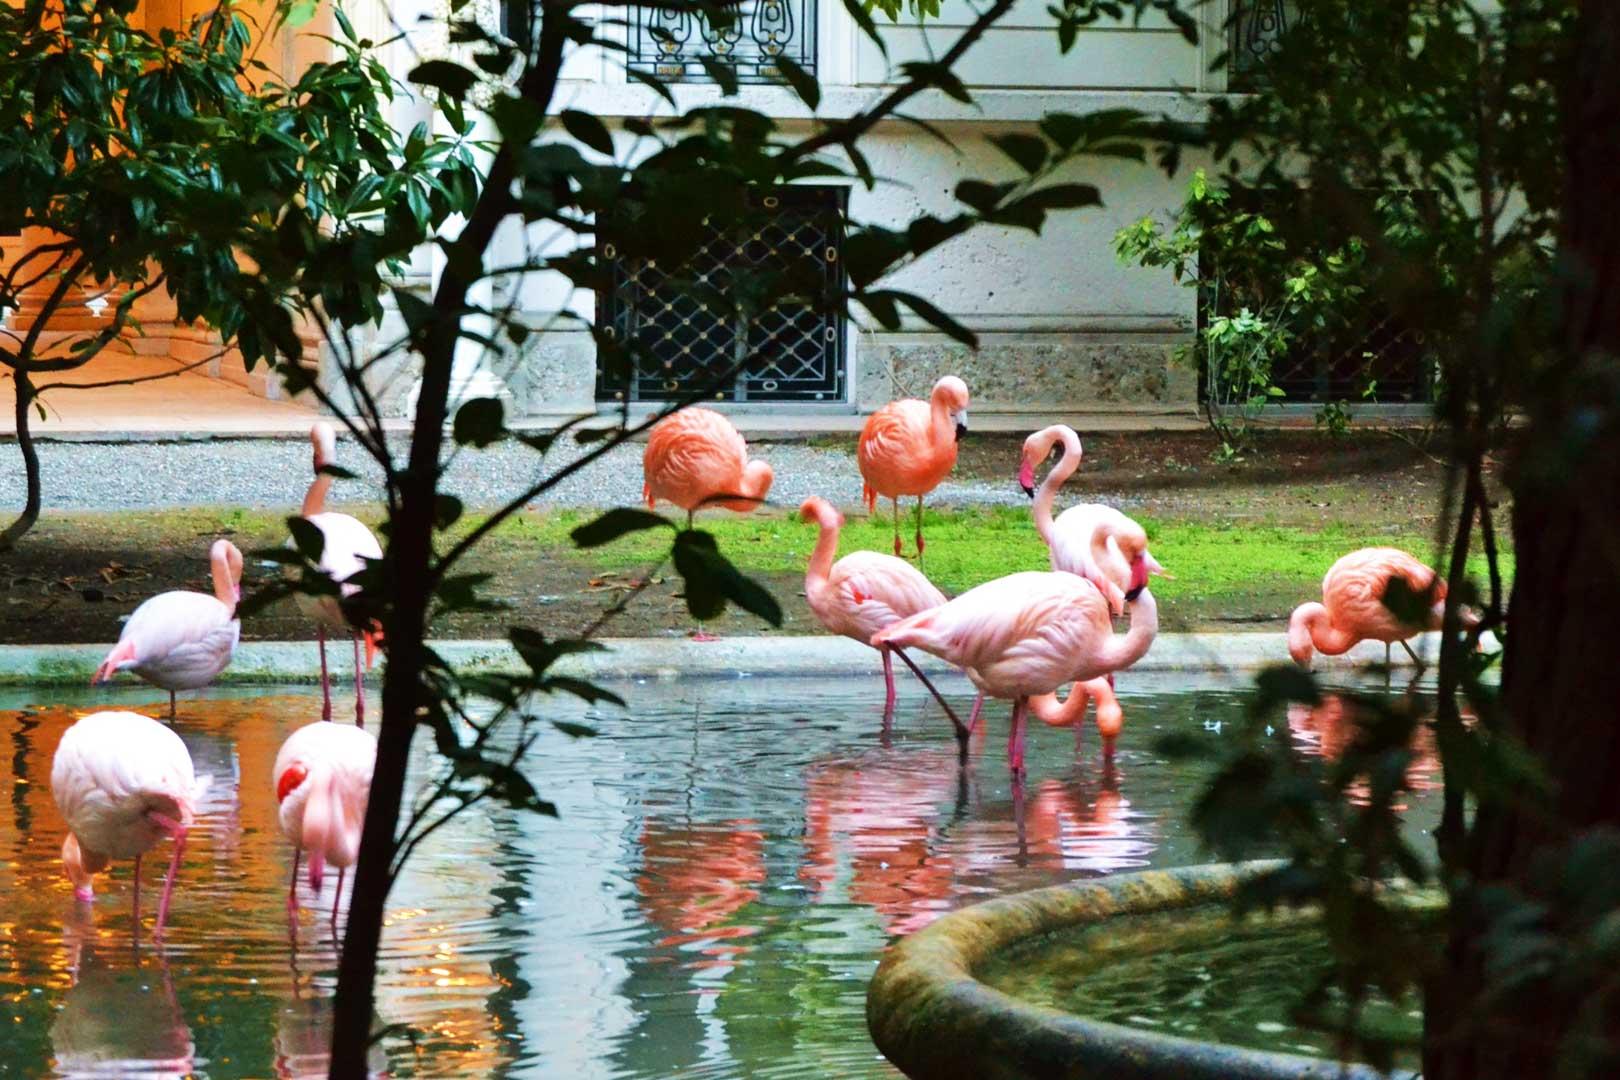 pink flamingos villa invernizzi flawless milano